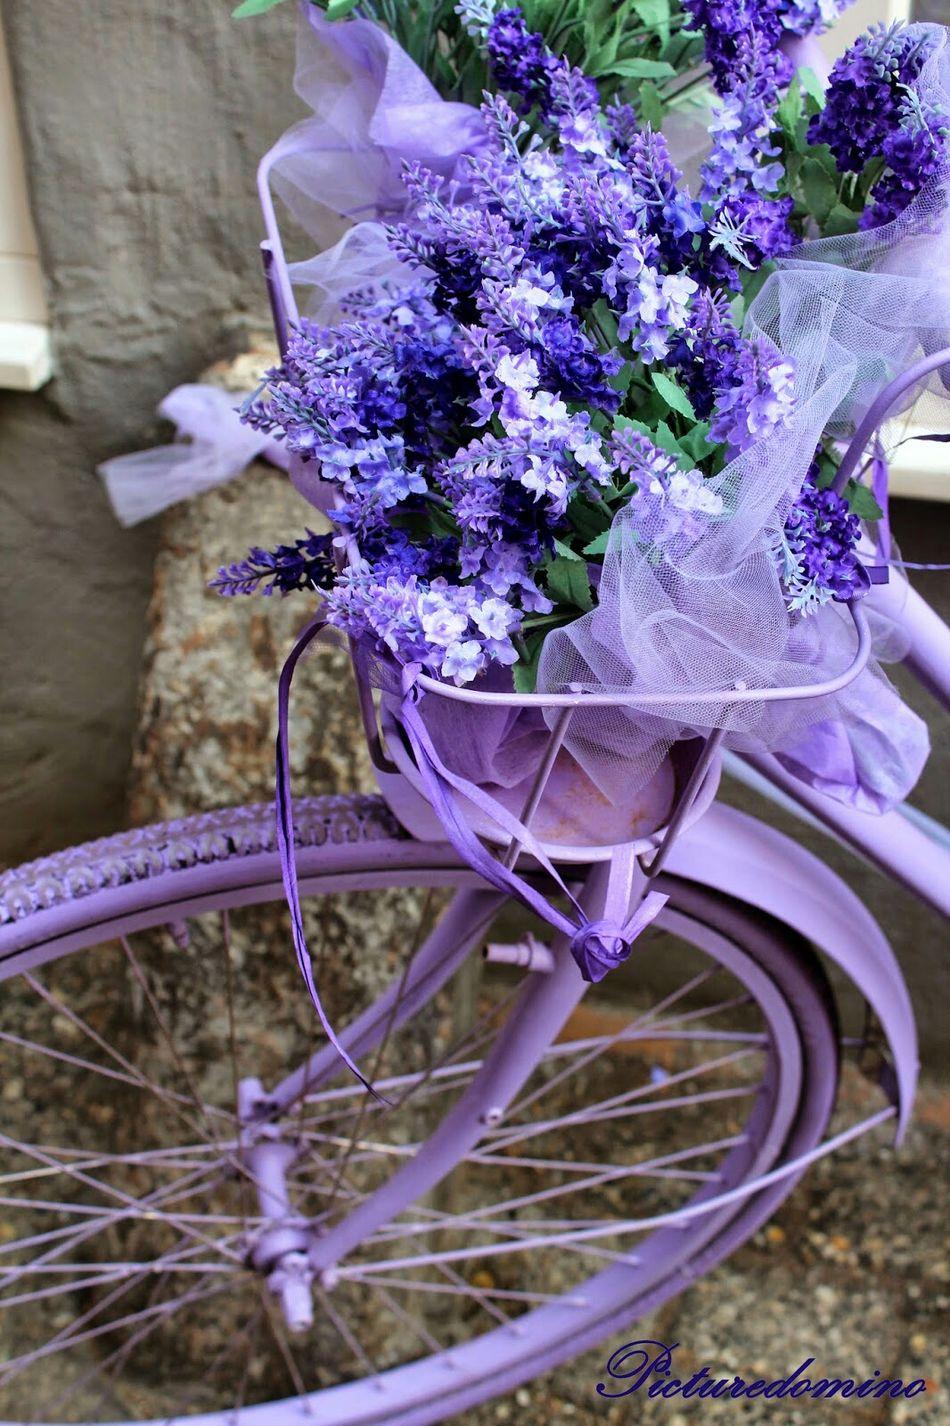 Bike Violet Flowers Spring Good Feeling